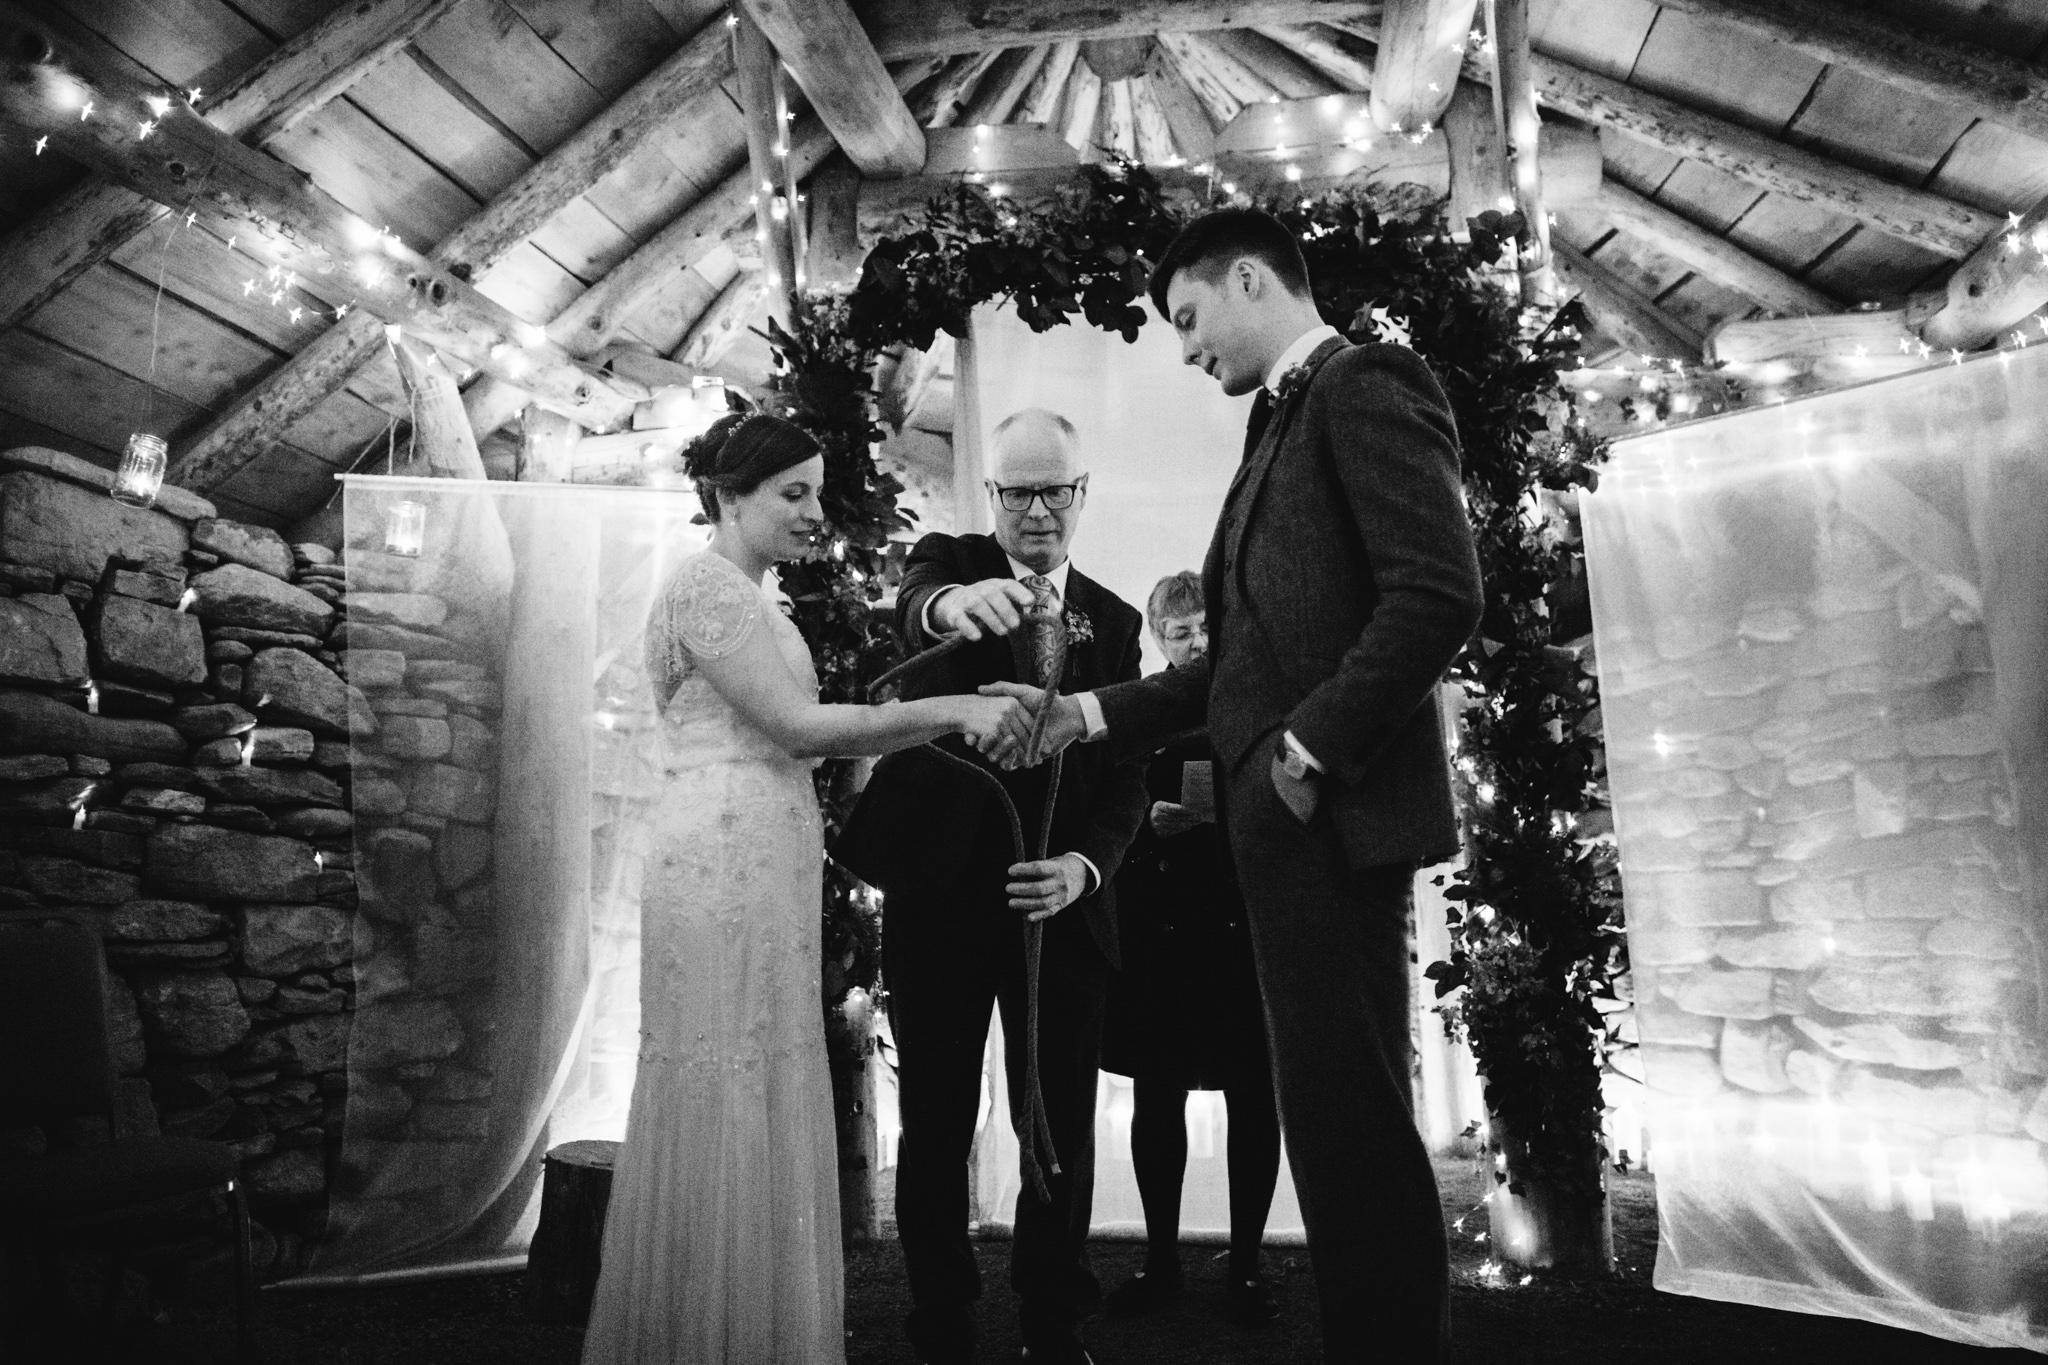 derbyshire-wedding-photographer-videographer-camera-hannah-61.jpg